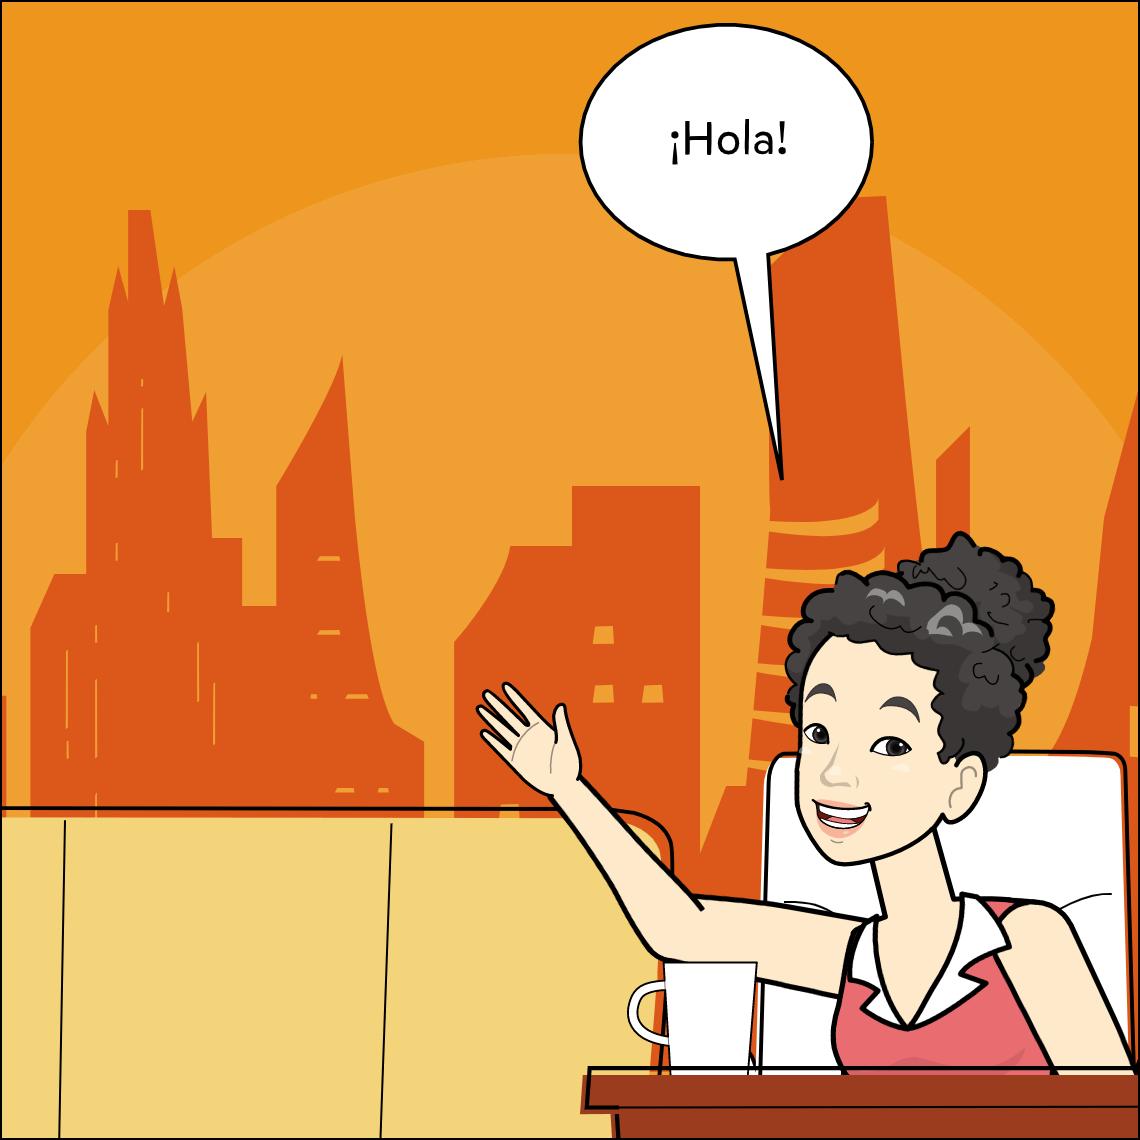 world languages Spanish lesson exemplar comic panel 1